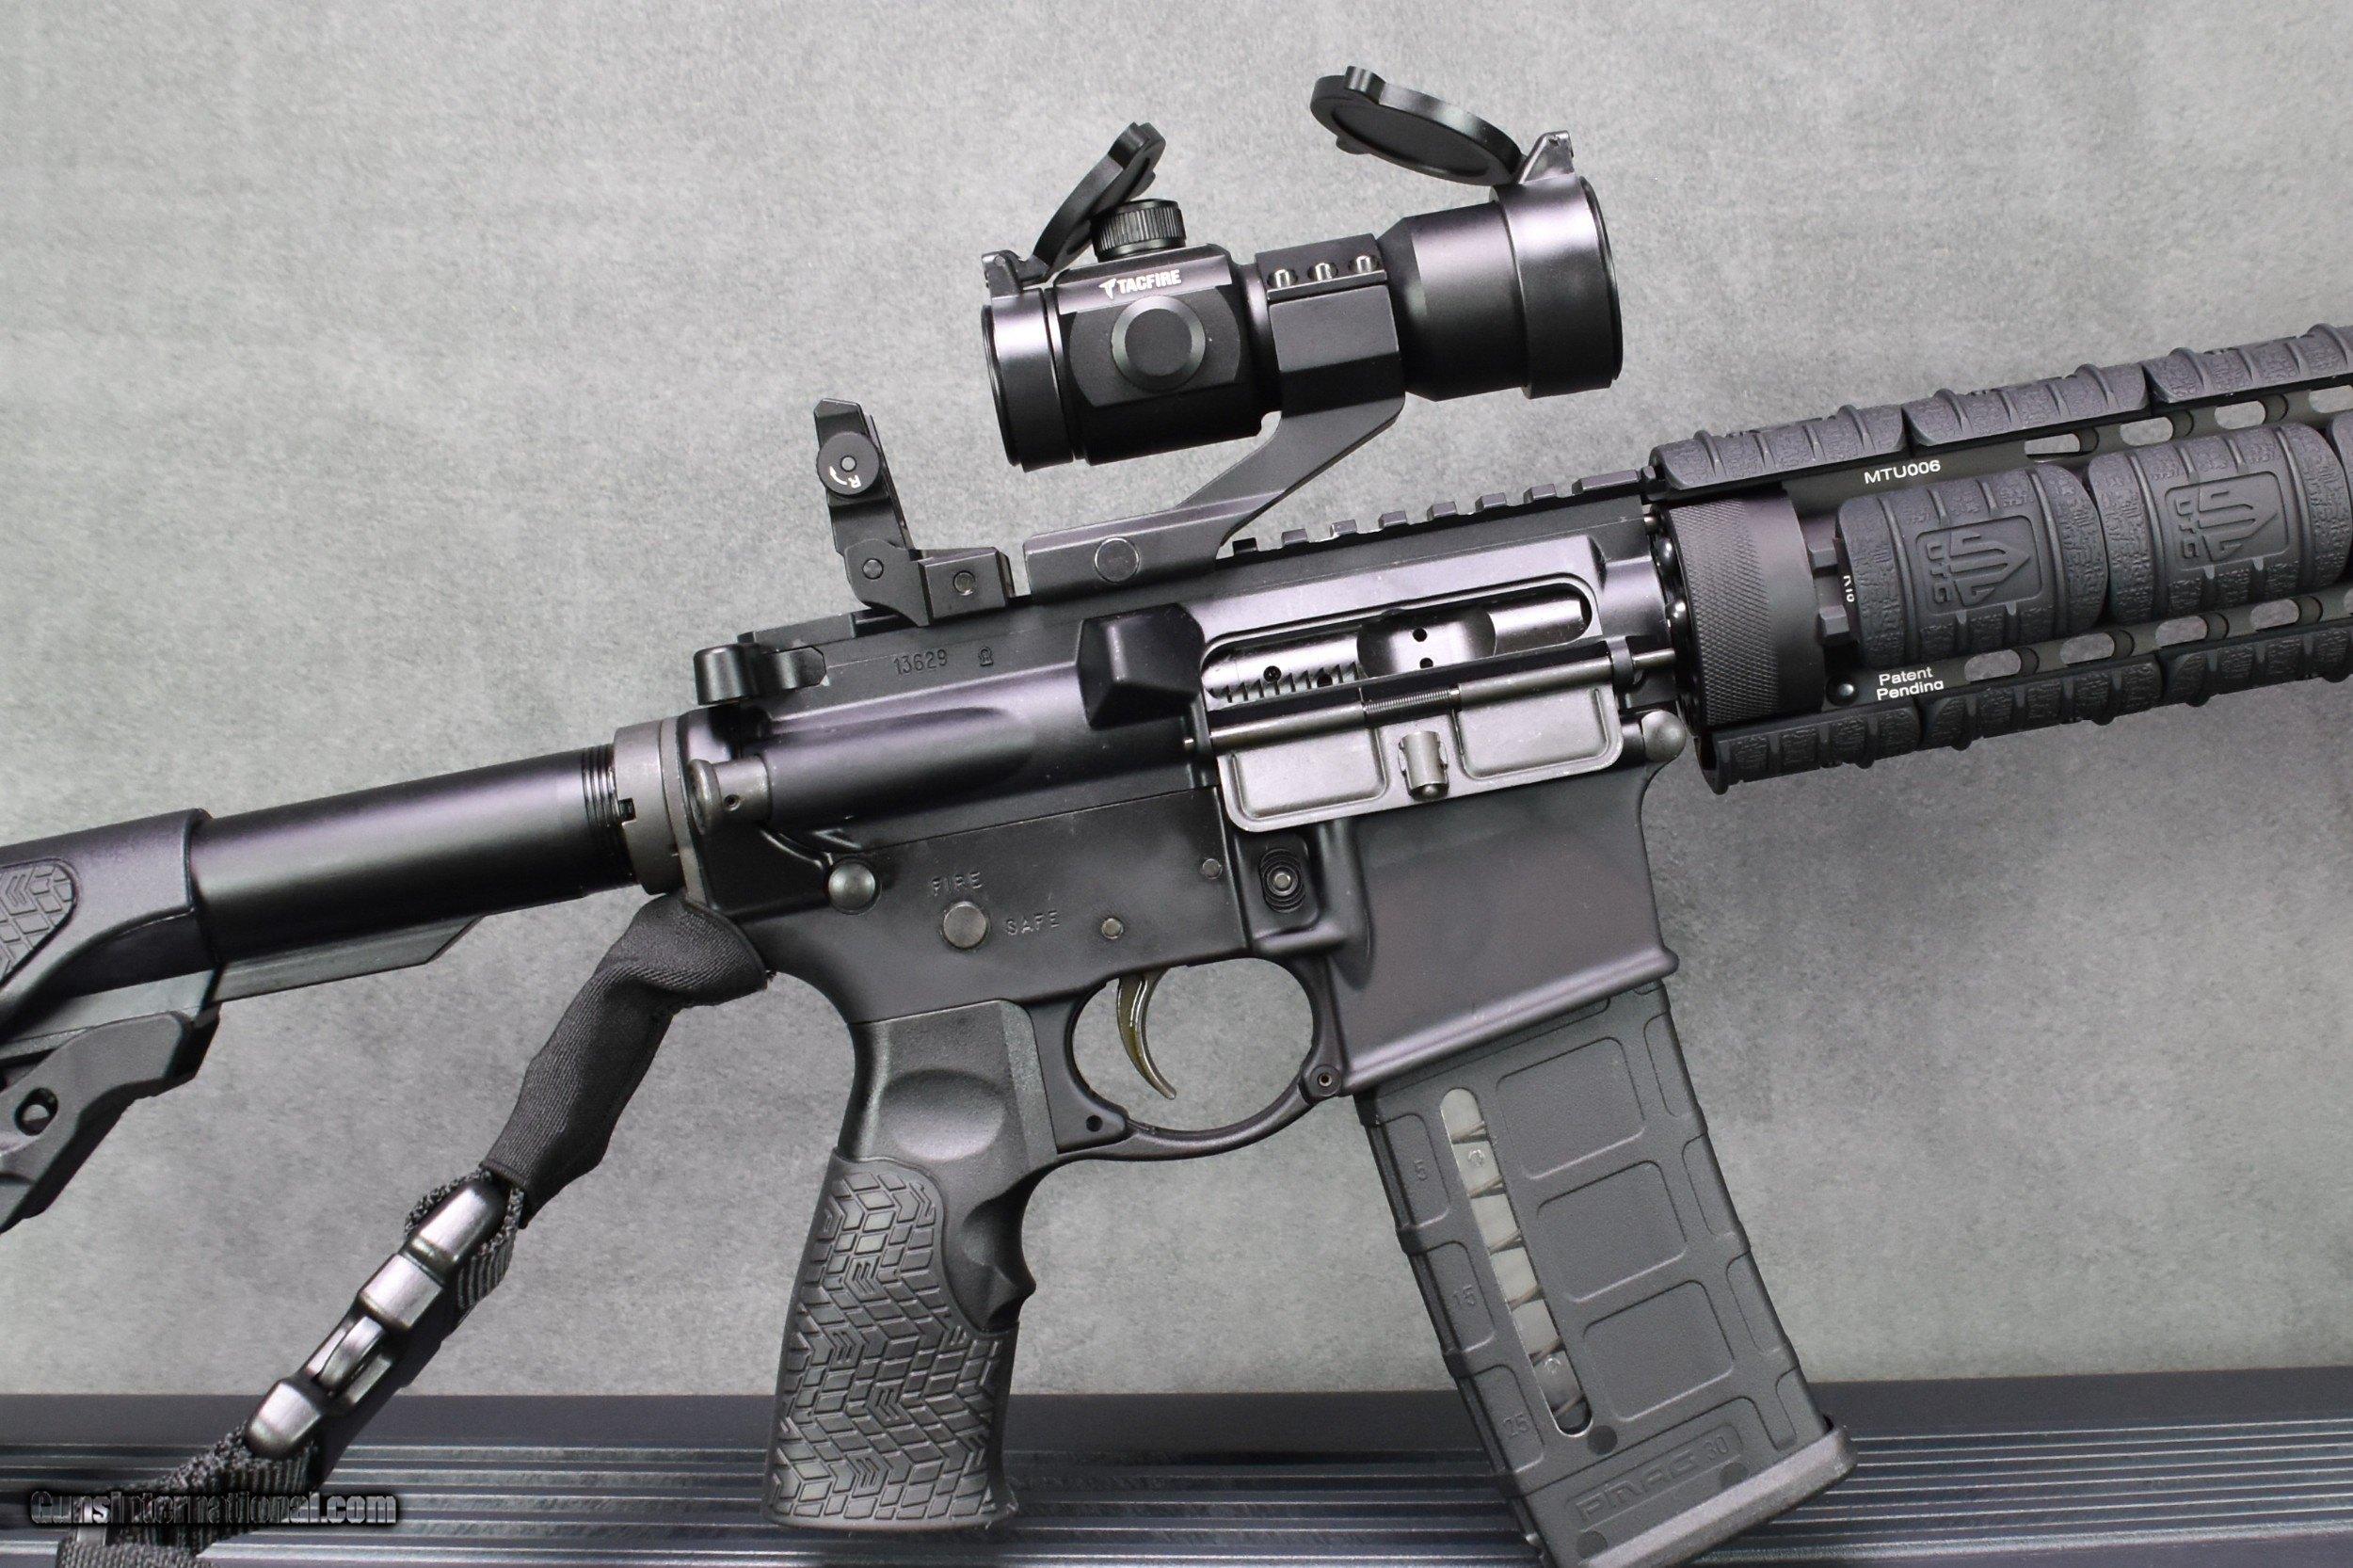 Light Carbine Colt Le6920 Vs Le6900 Wwwtollebildcom